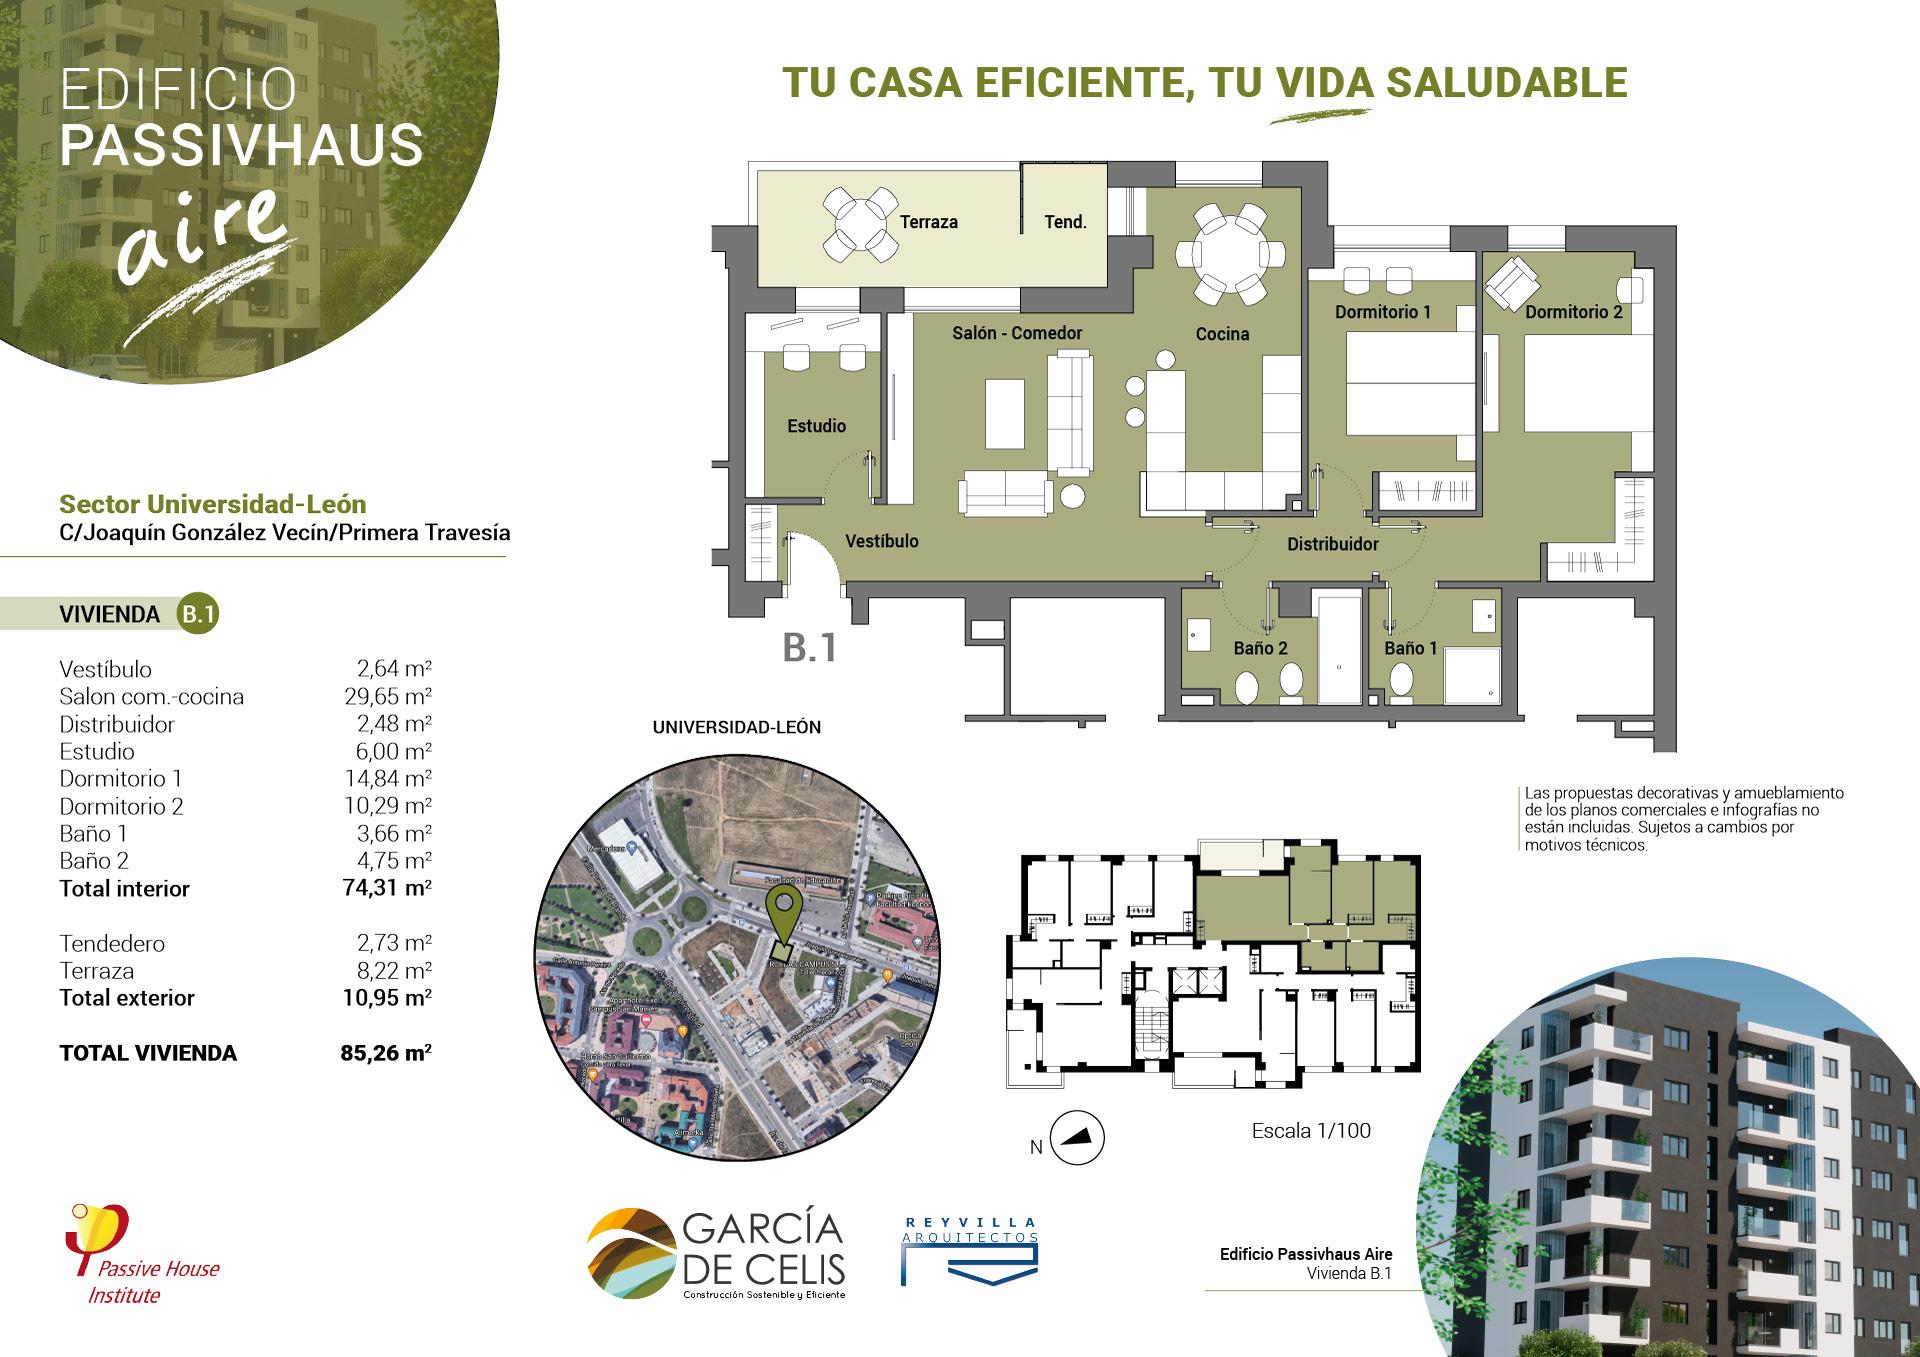 Plano vivienda B.1 - 2 dormitorios